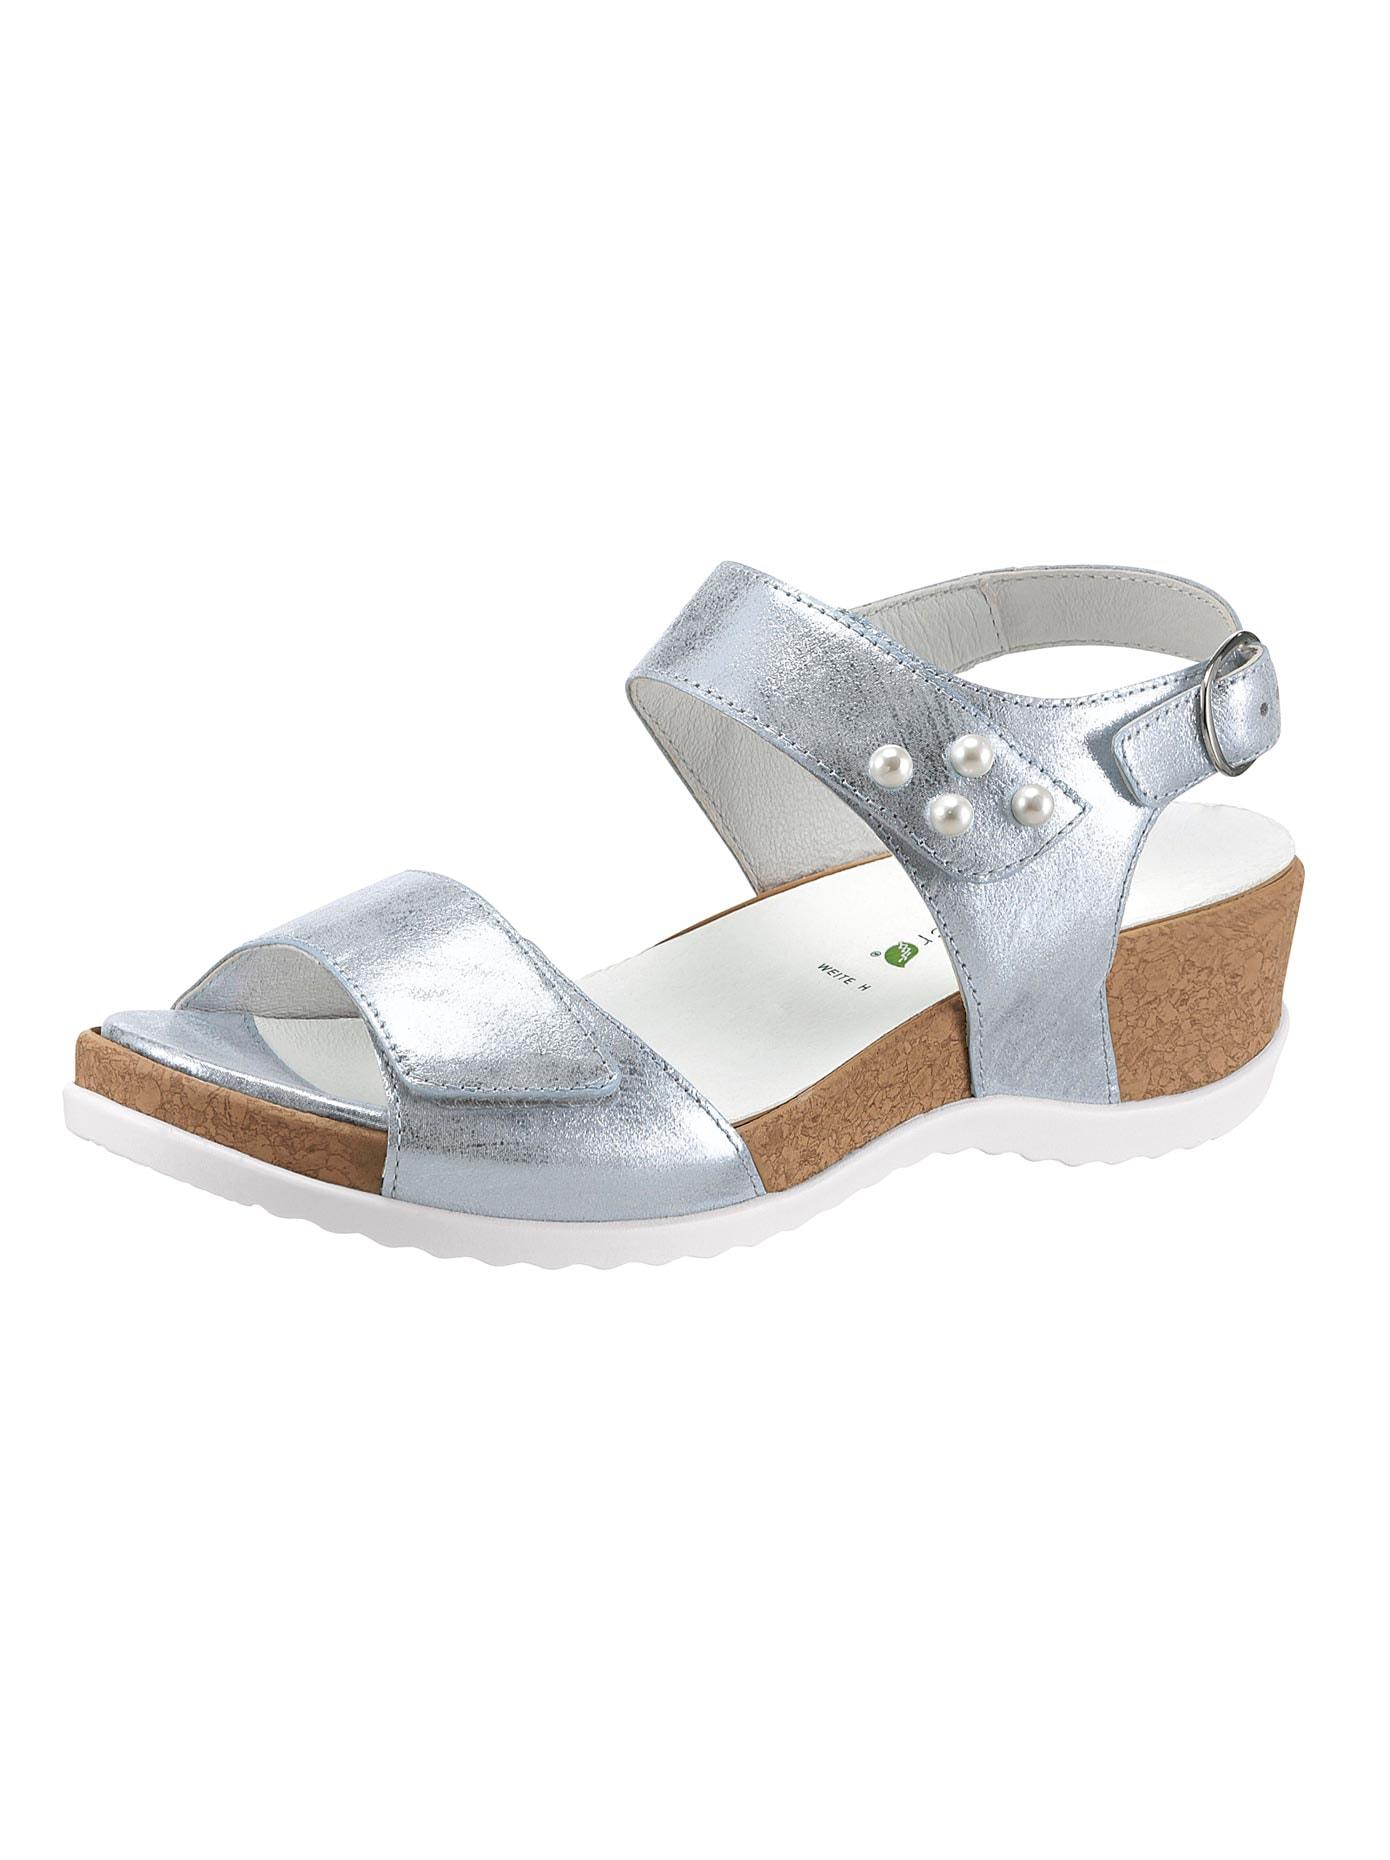 Online Damen Schuhe Sandalenamp; KaufenDamenmode » Zehentrenner byI6gf7vY